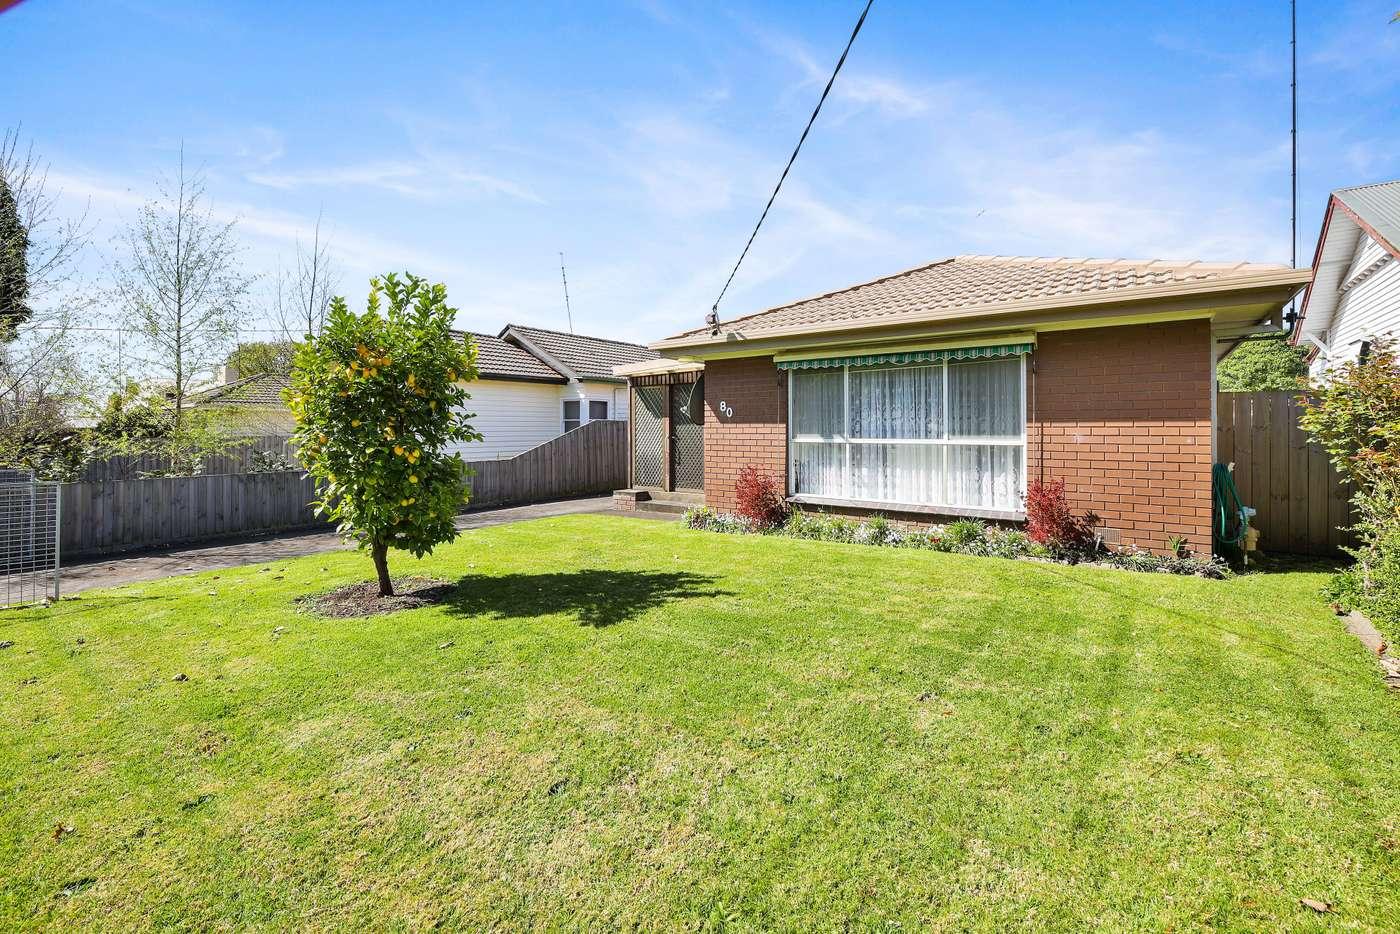 Main view of Homely house listing, 80 Anzac Road, Trafalgar VIC 3824